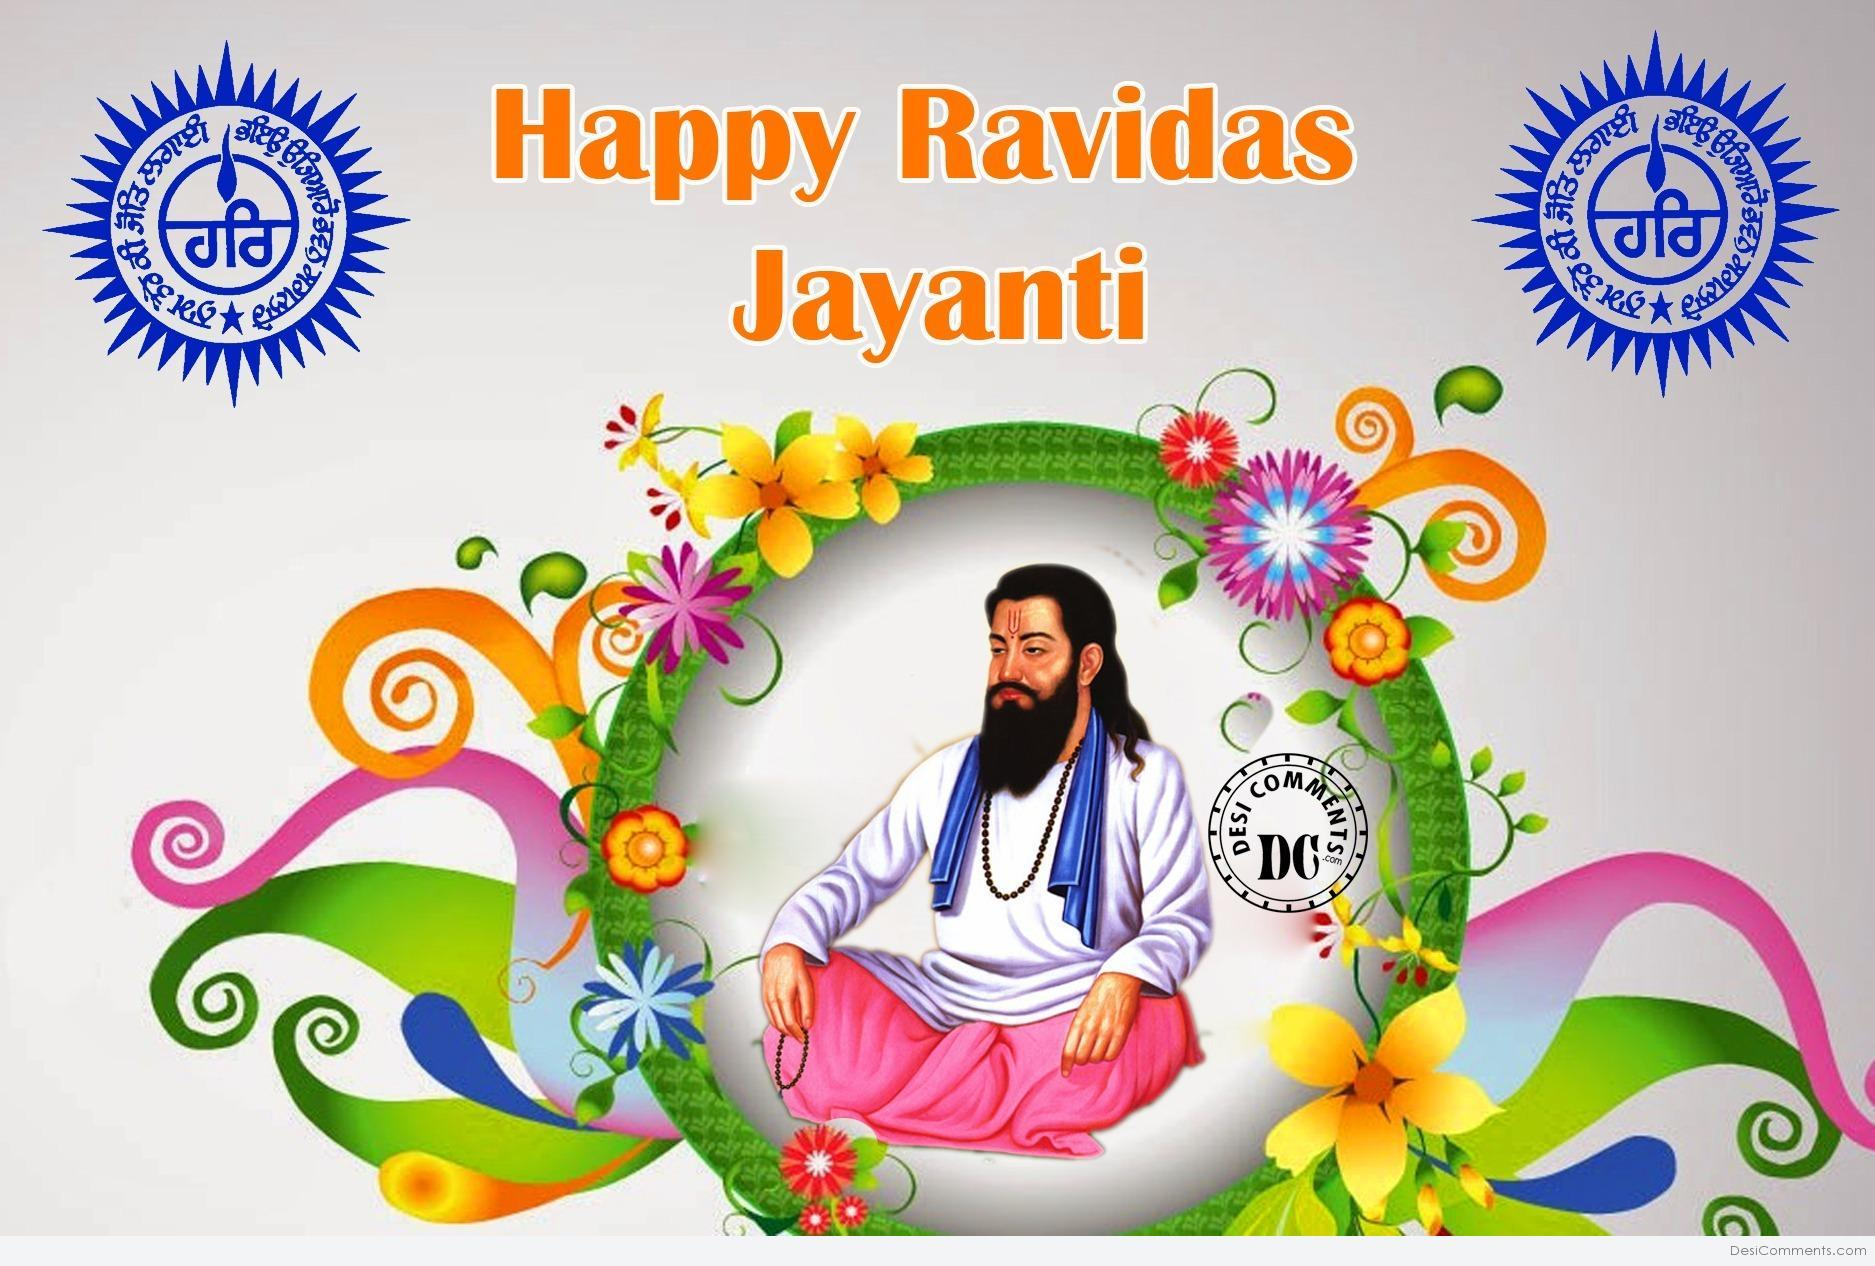 Guru Ravidas Jayanti Full HD Images